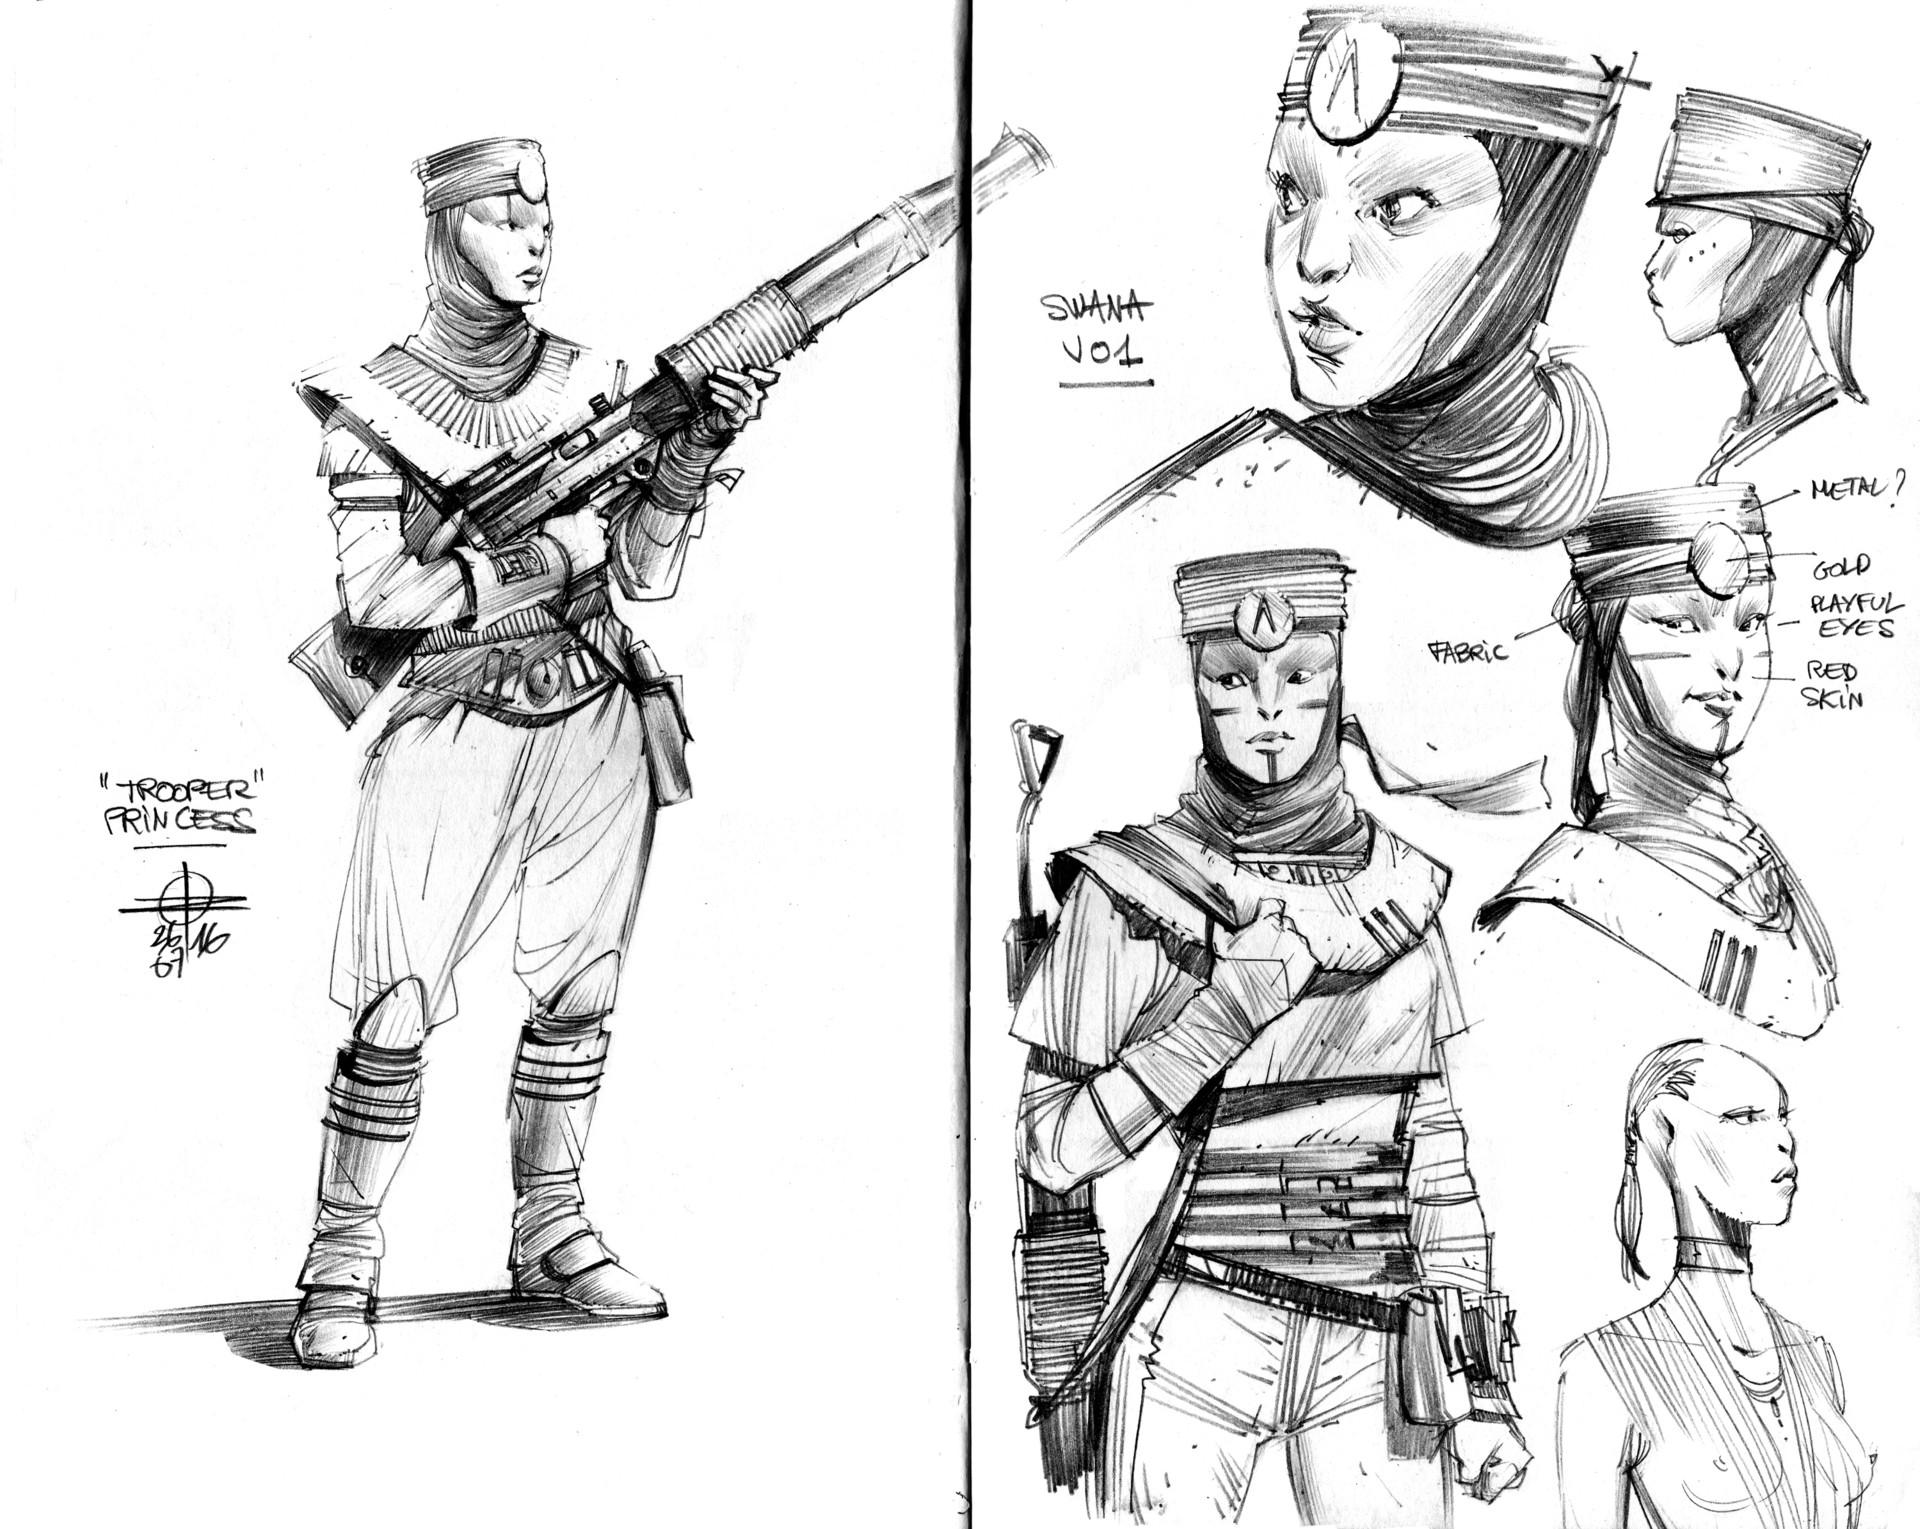 Renaud roche part05 sketches02b